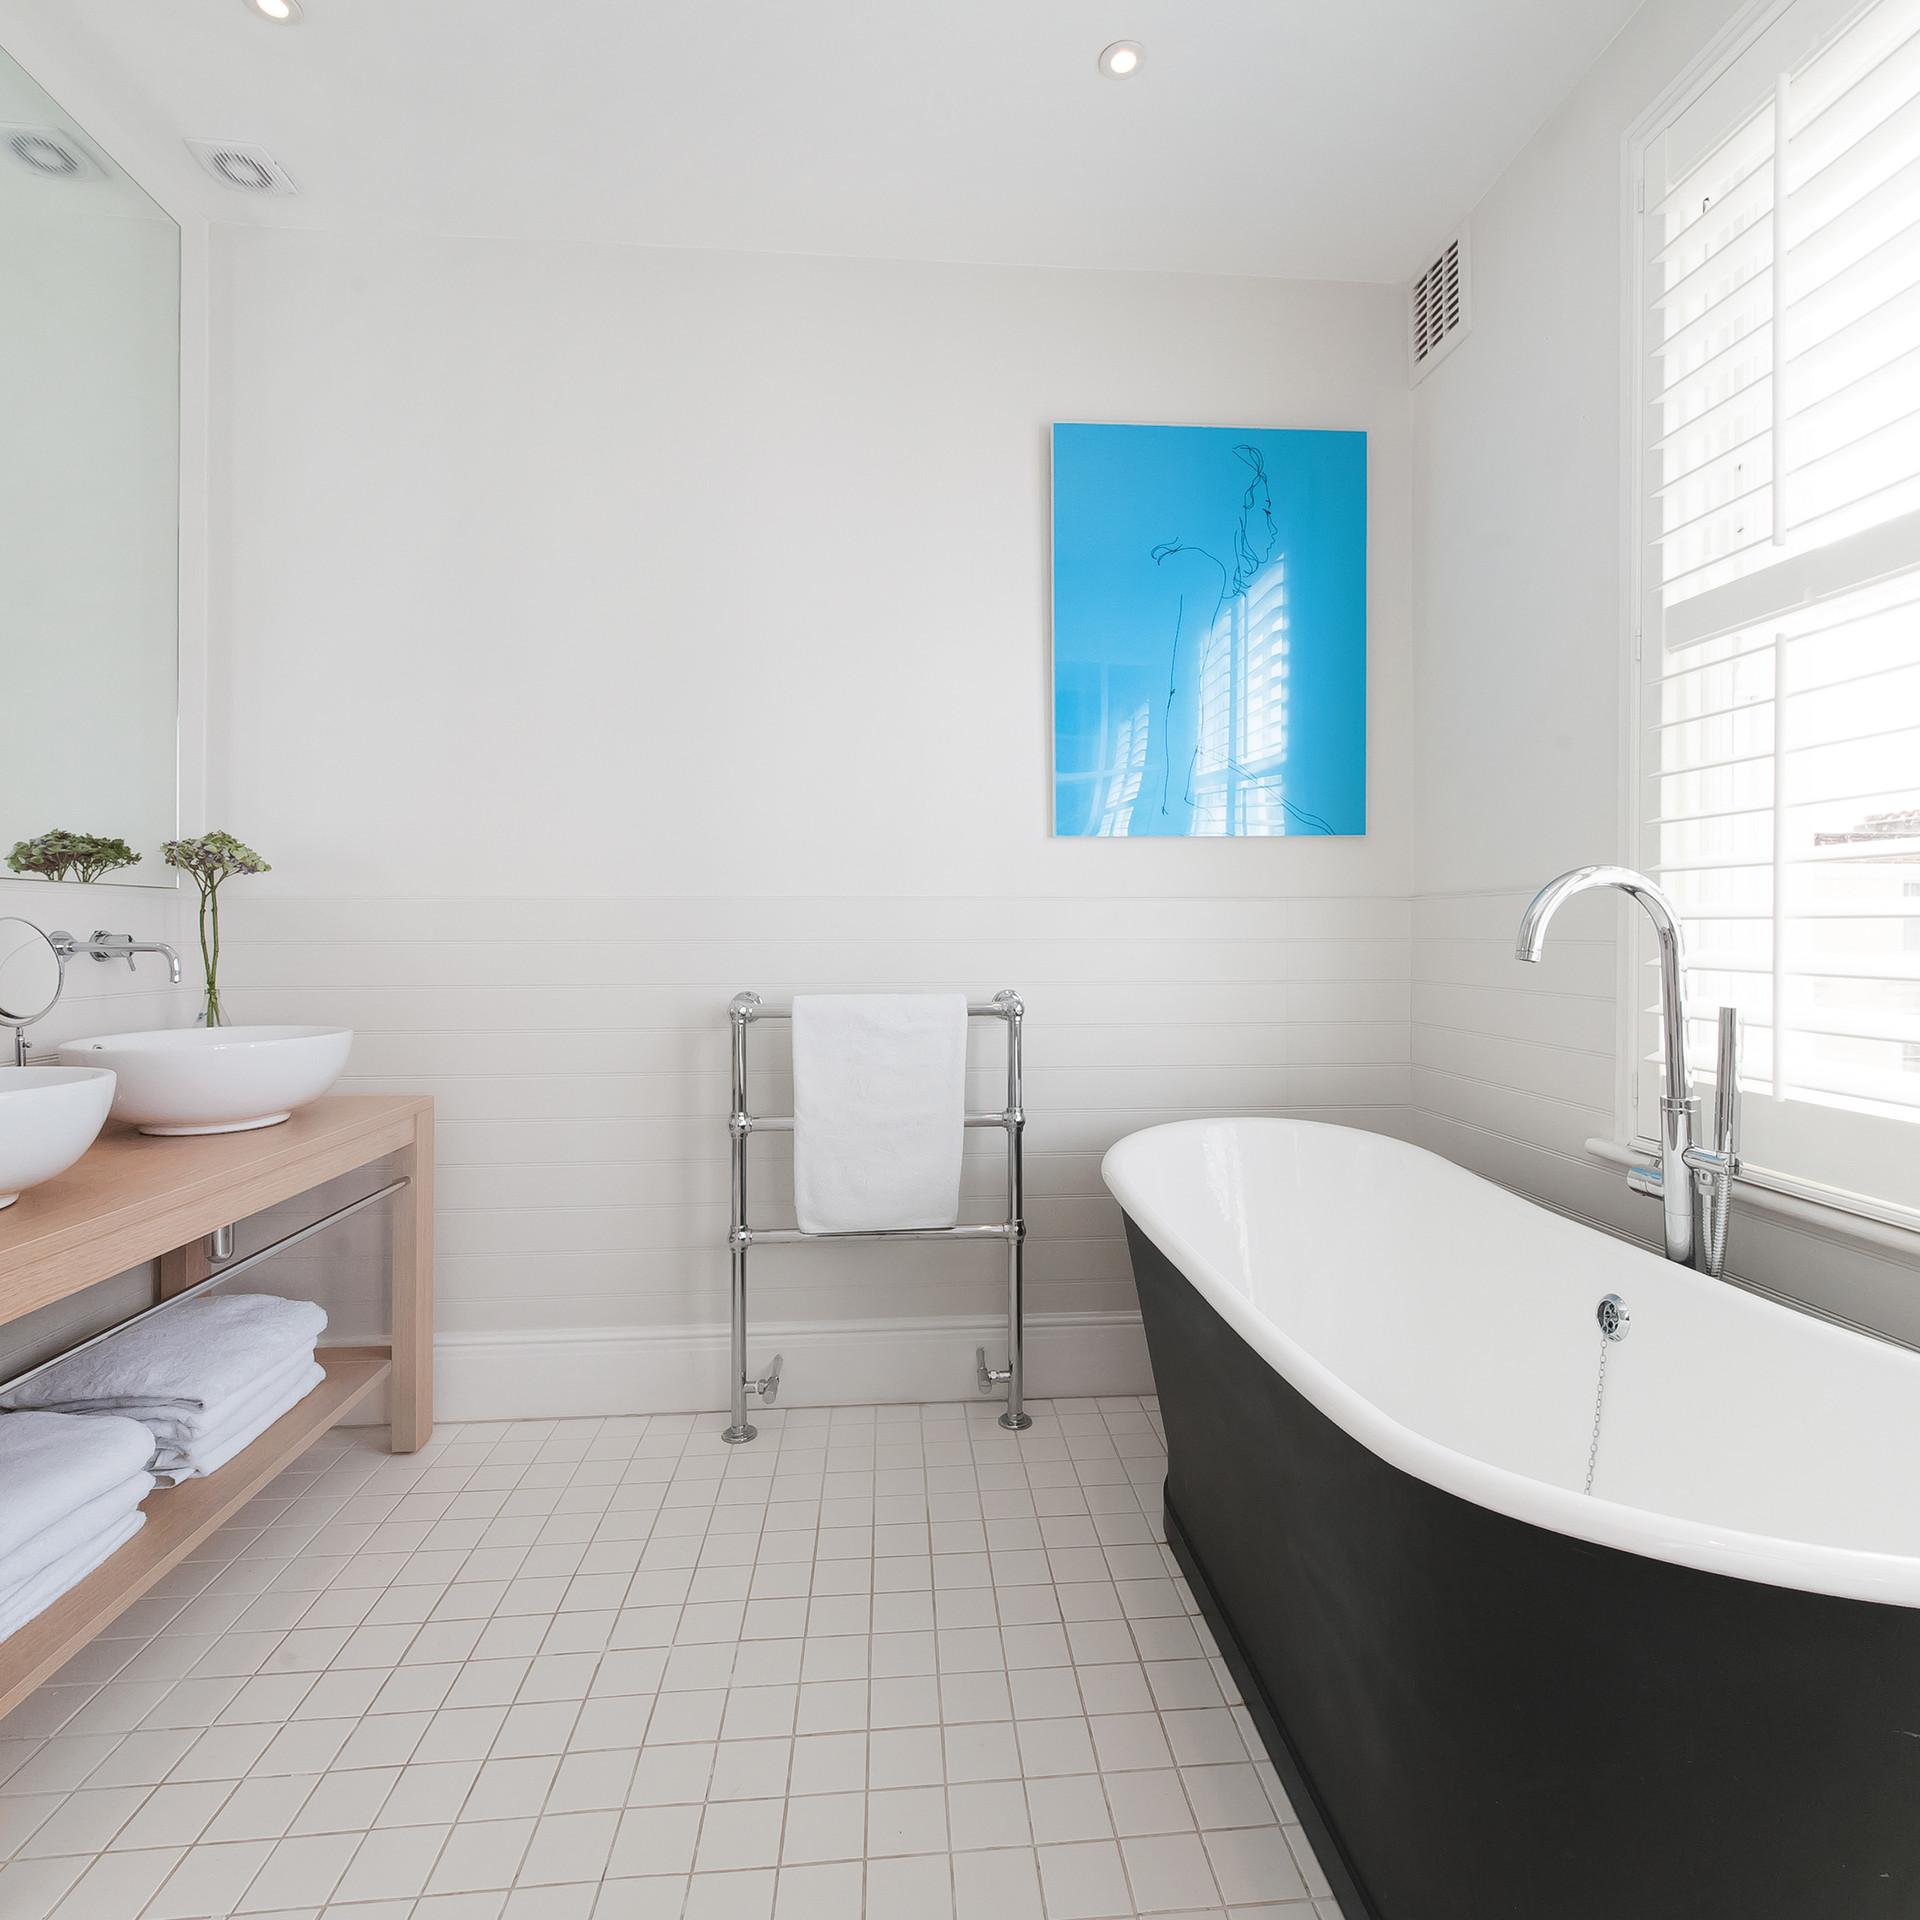 Bathroom with rolltop bath.jpg